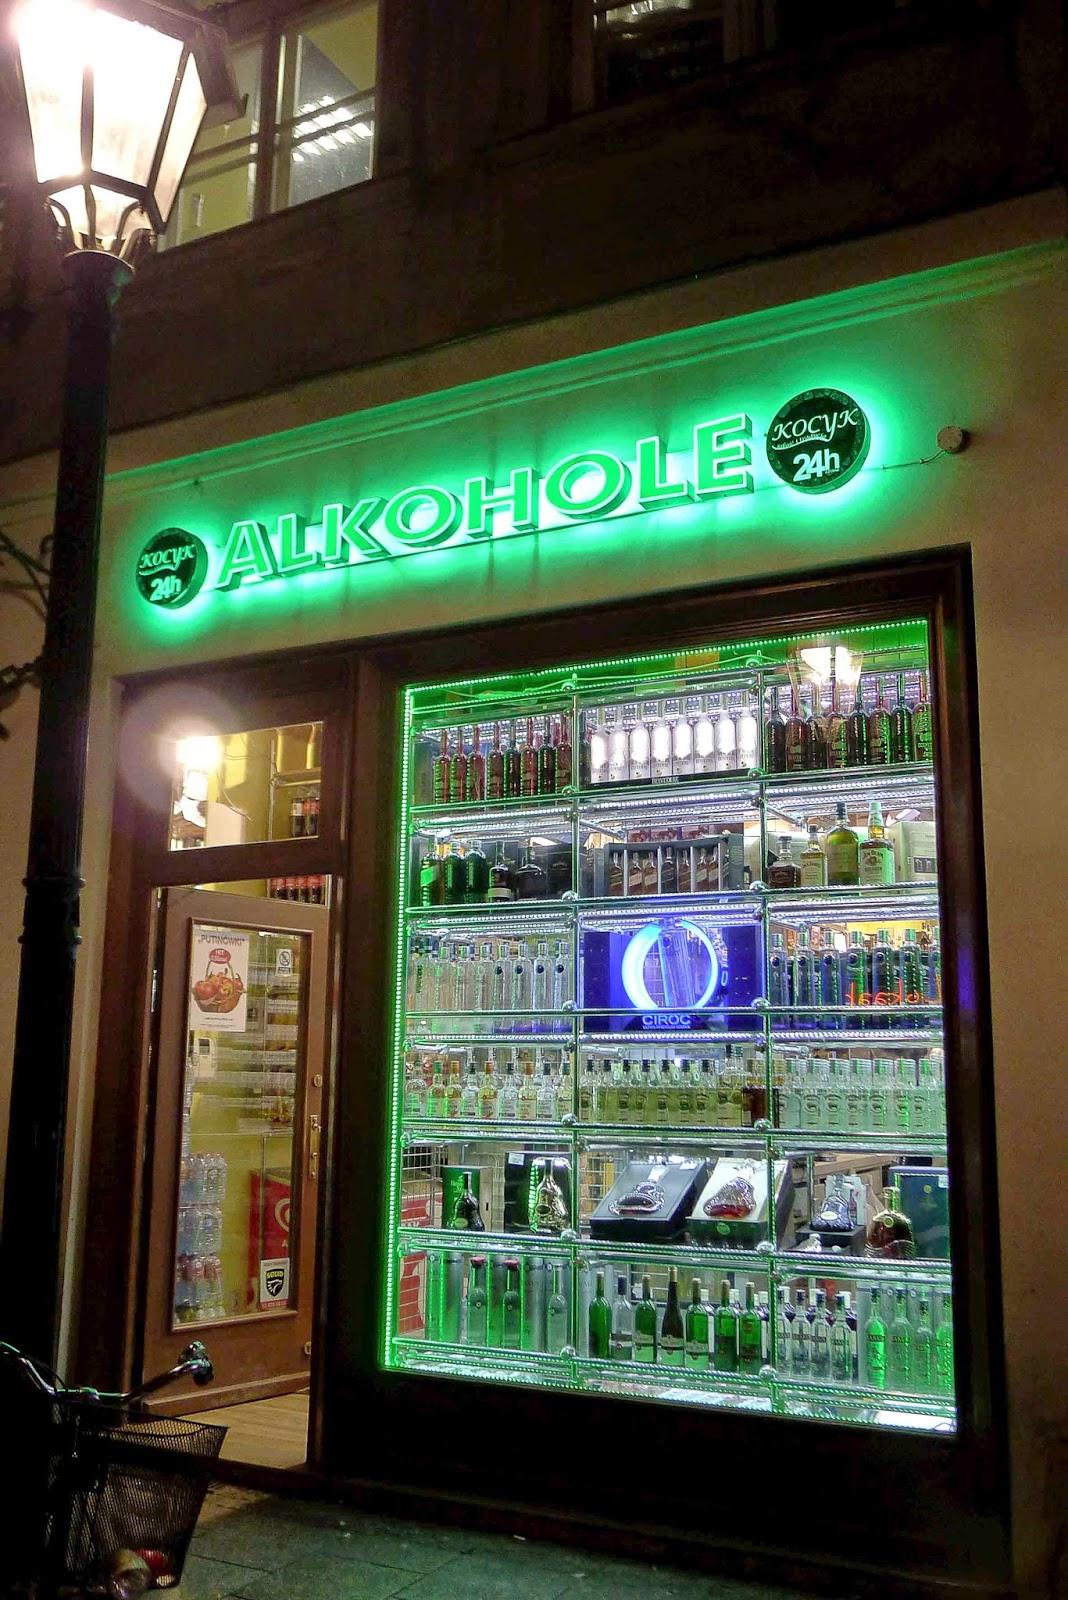 Alkohole Liquor Store